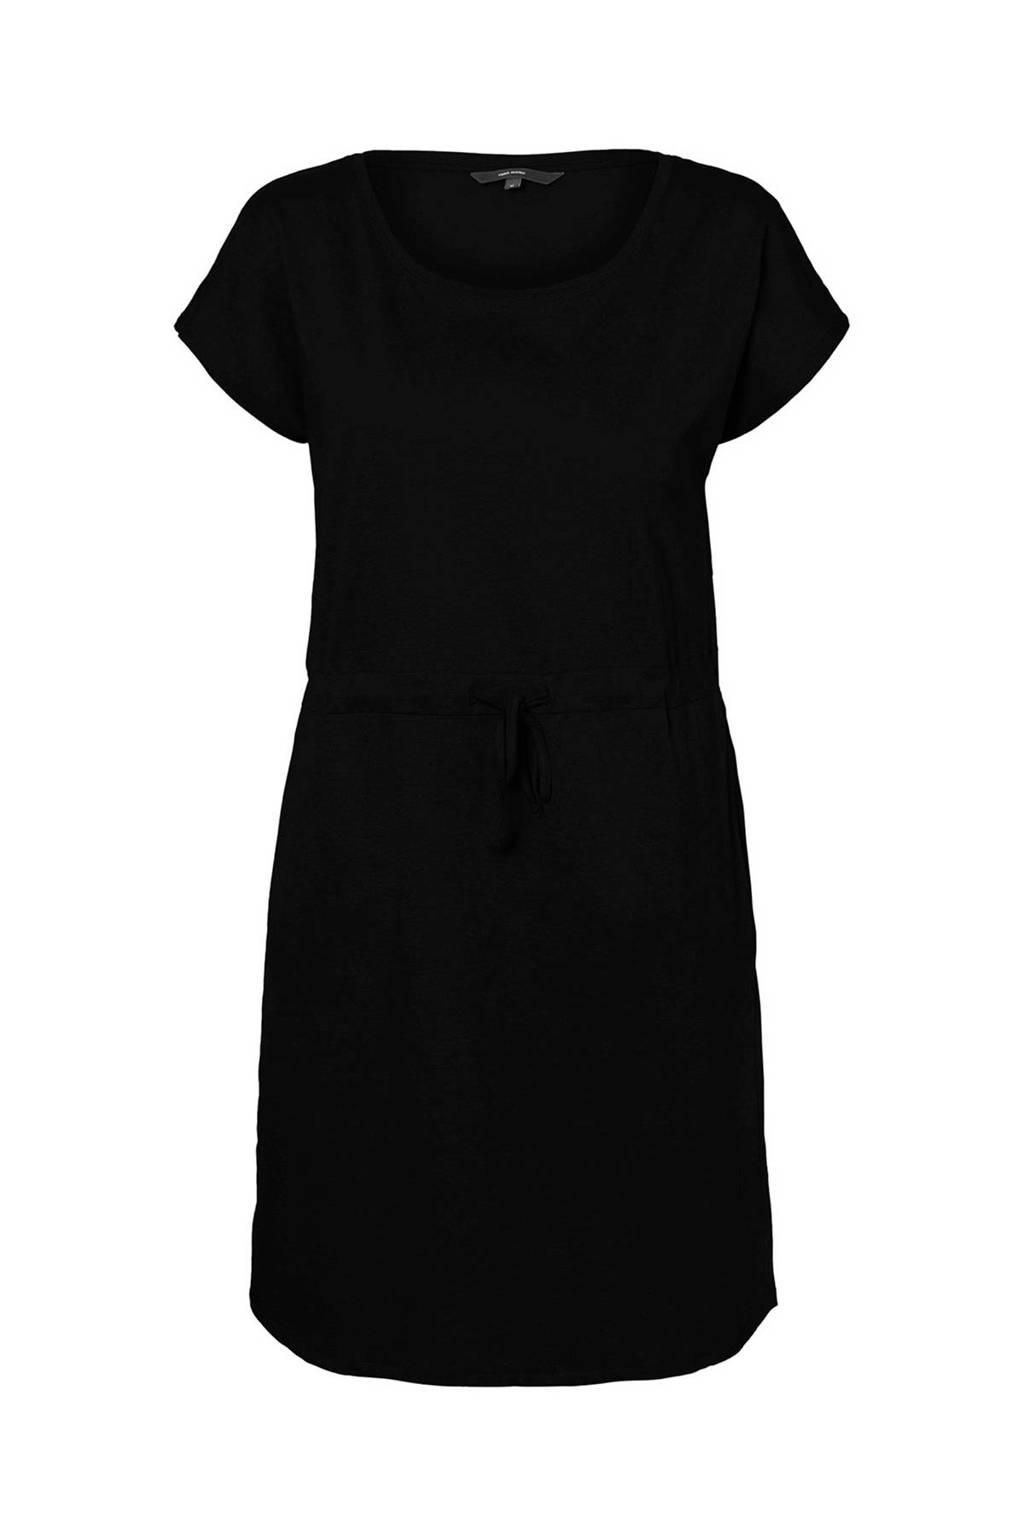 AWARE by VERO MODA jurk met steekzakken zwart, Zwart